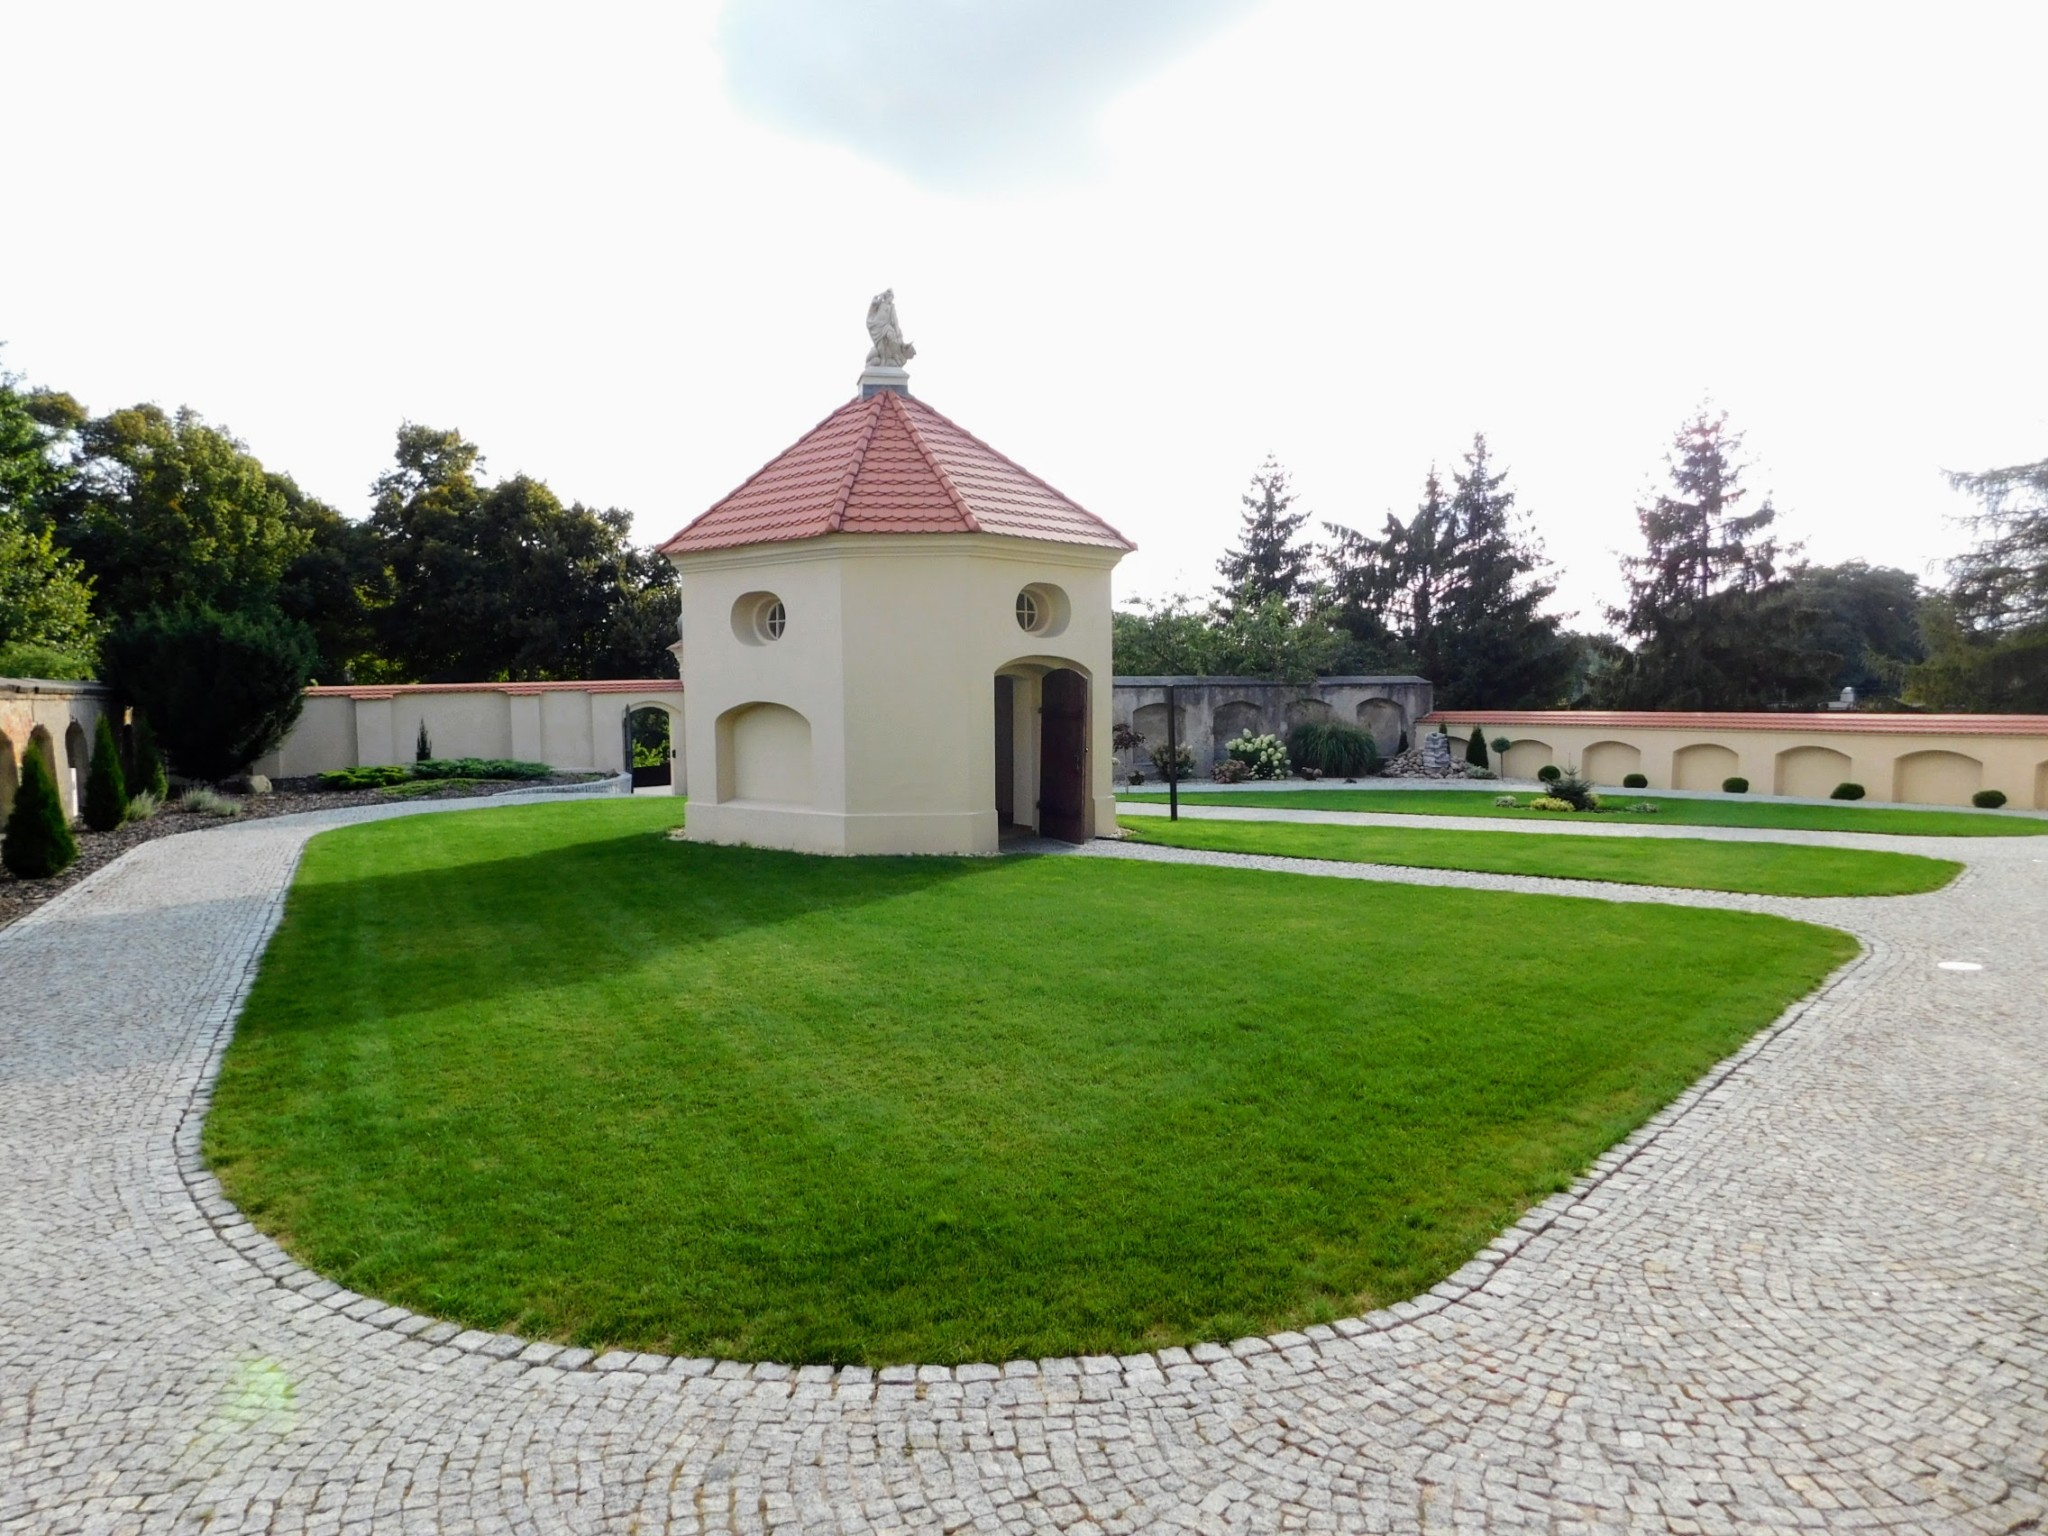 kaplica św. Judy Tadeusza na dziedzińcu